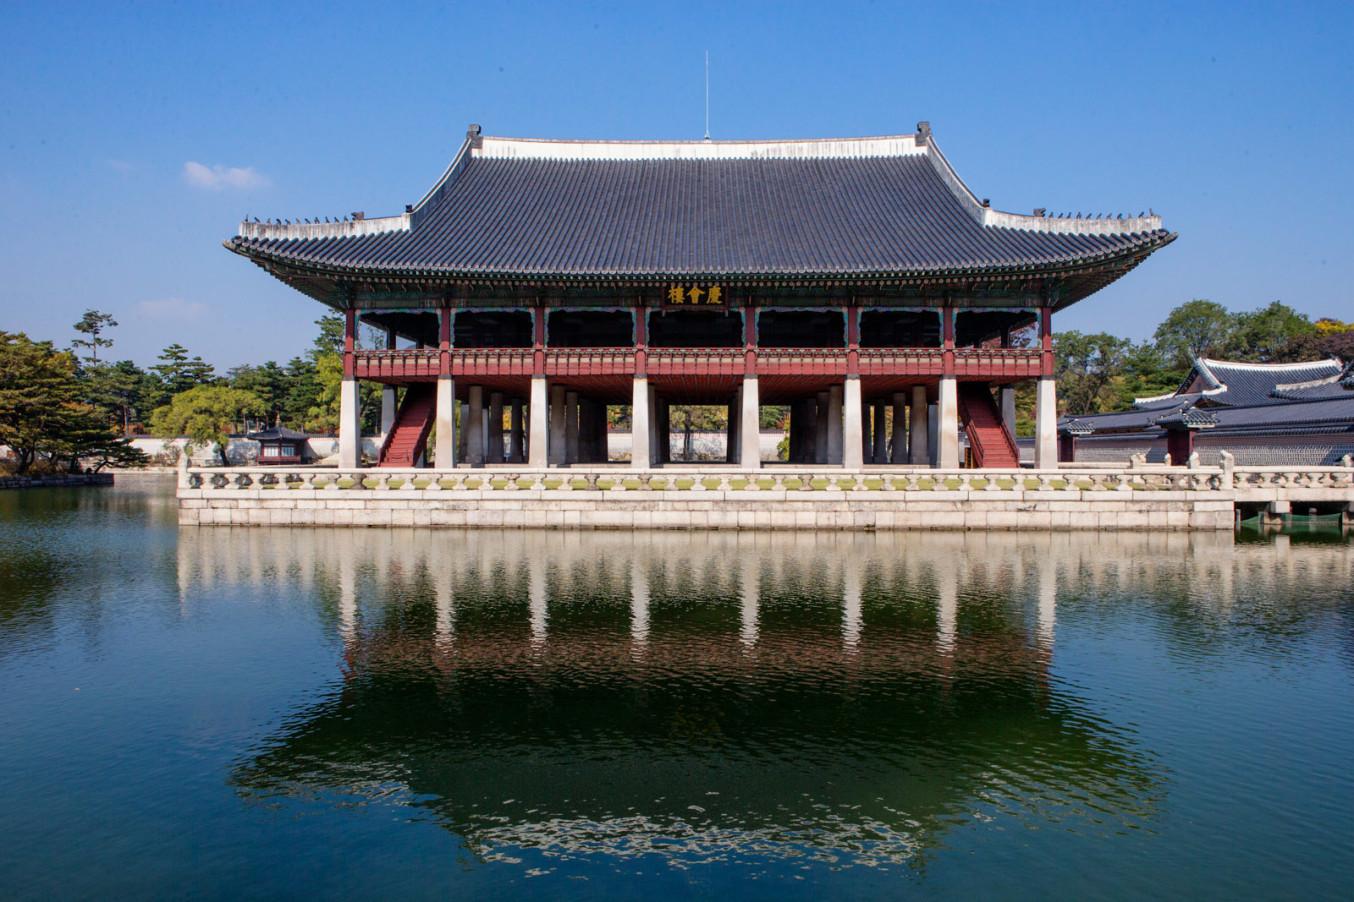 #11_OW_0231_Gyeongbokgung Palace